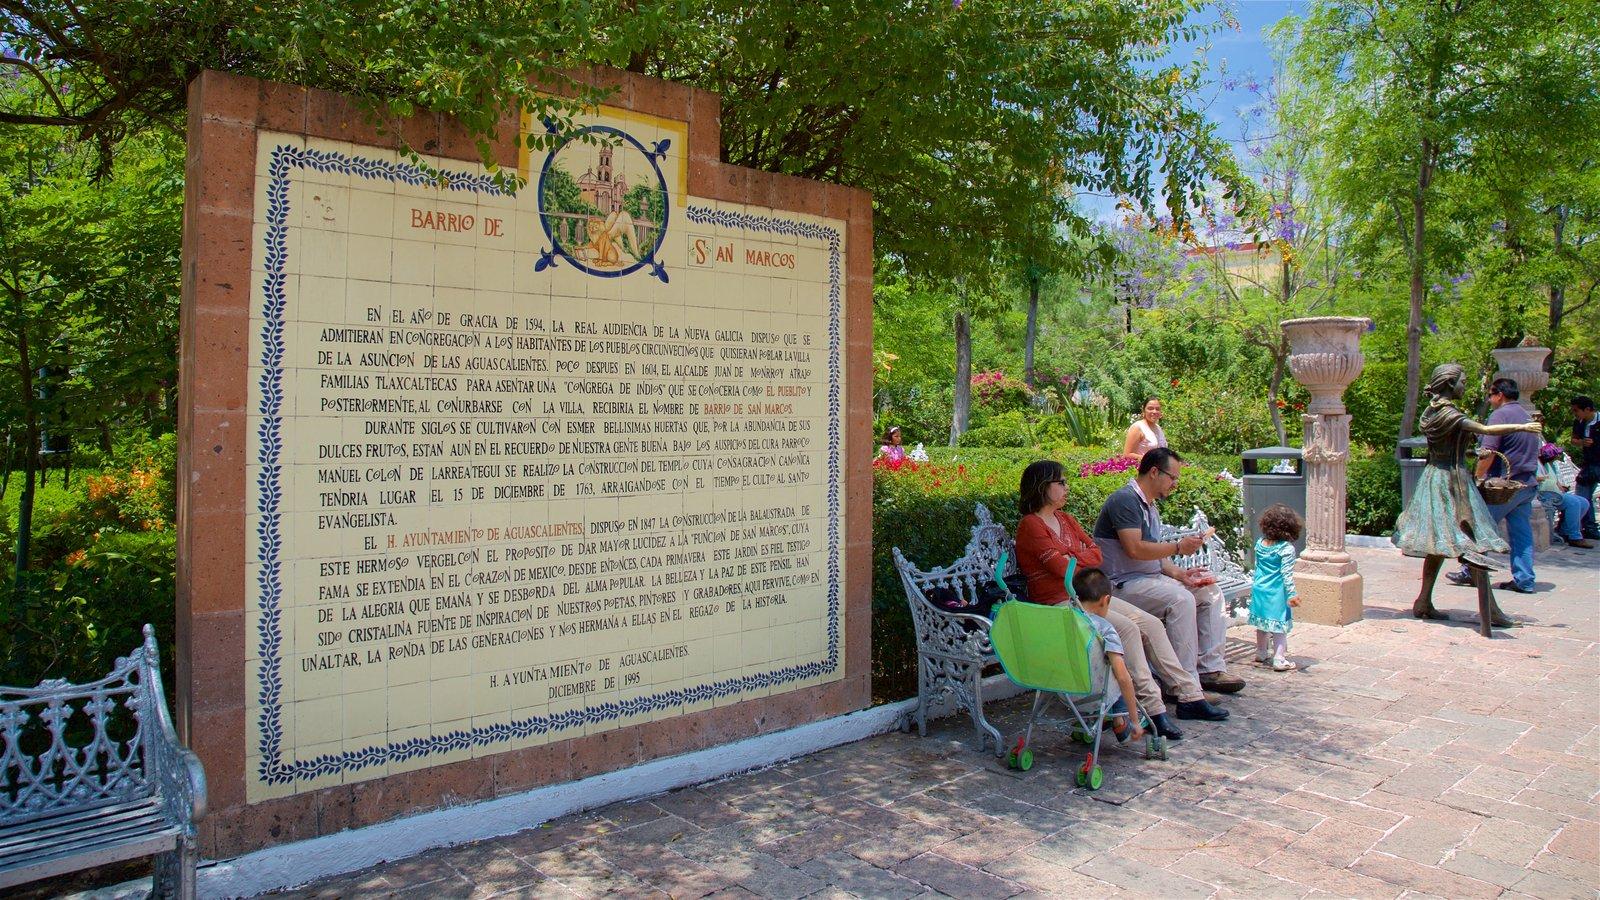 People Pictures: View Images of Jardin de San Marcos